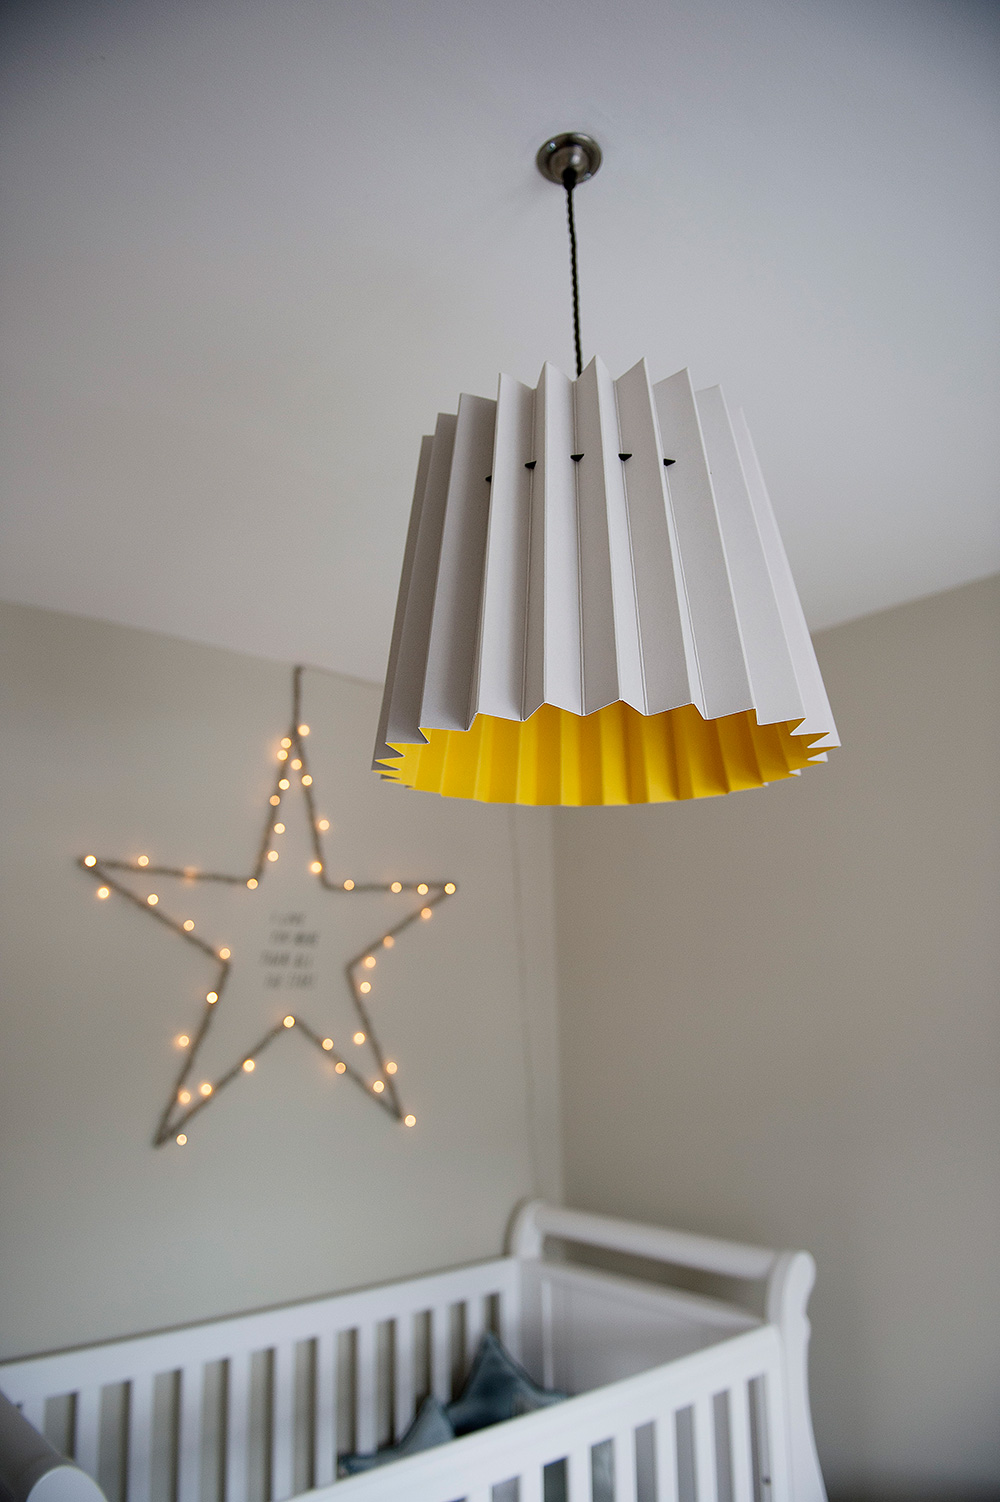 nursery interior design, Nikkirees.com, childrens lighting design, kids bedroom decor, interior designer Wimbledon London Surrey